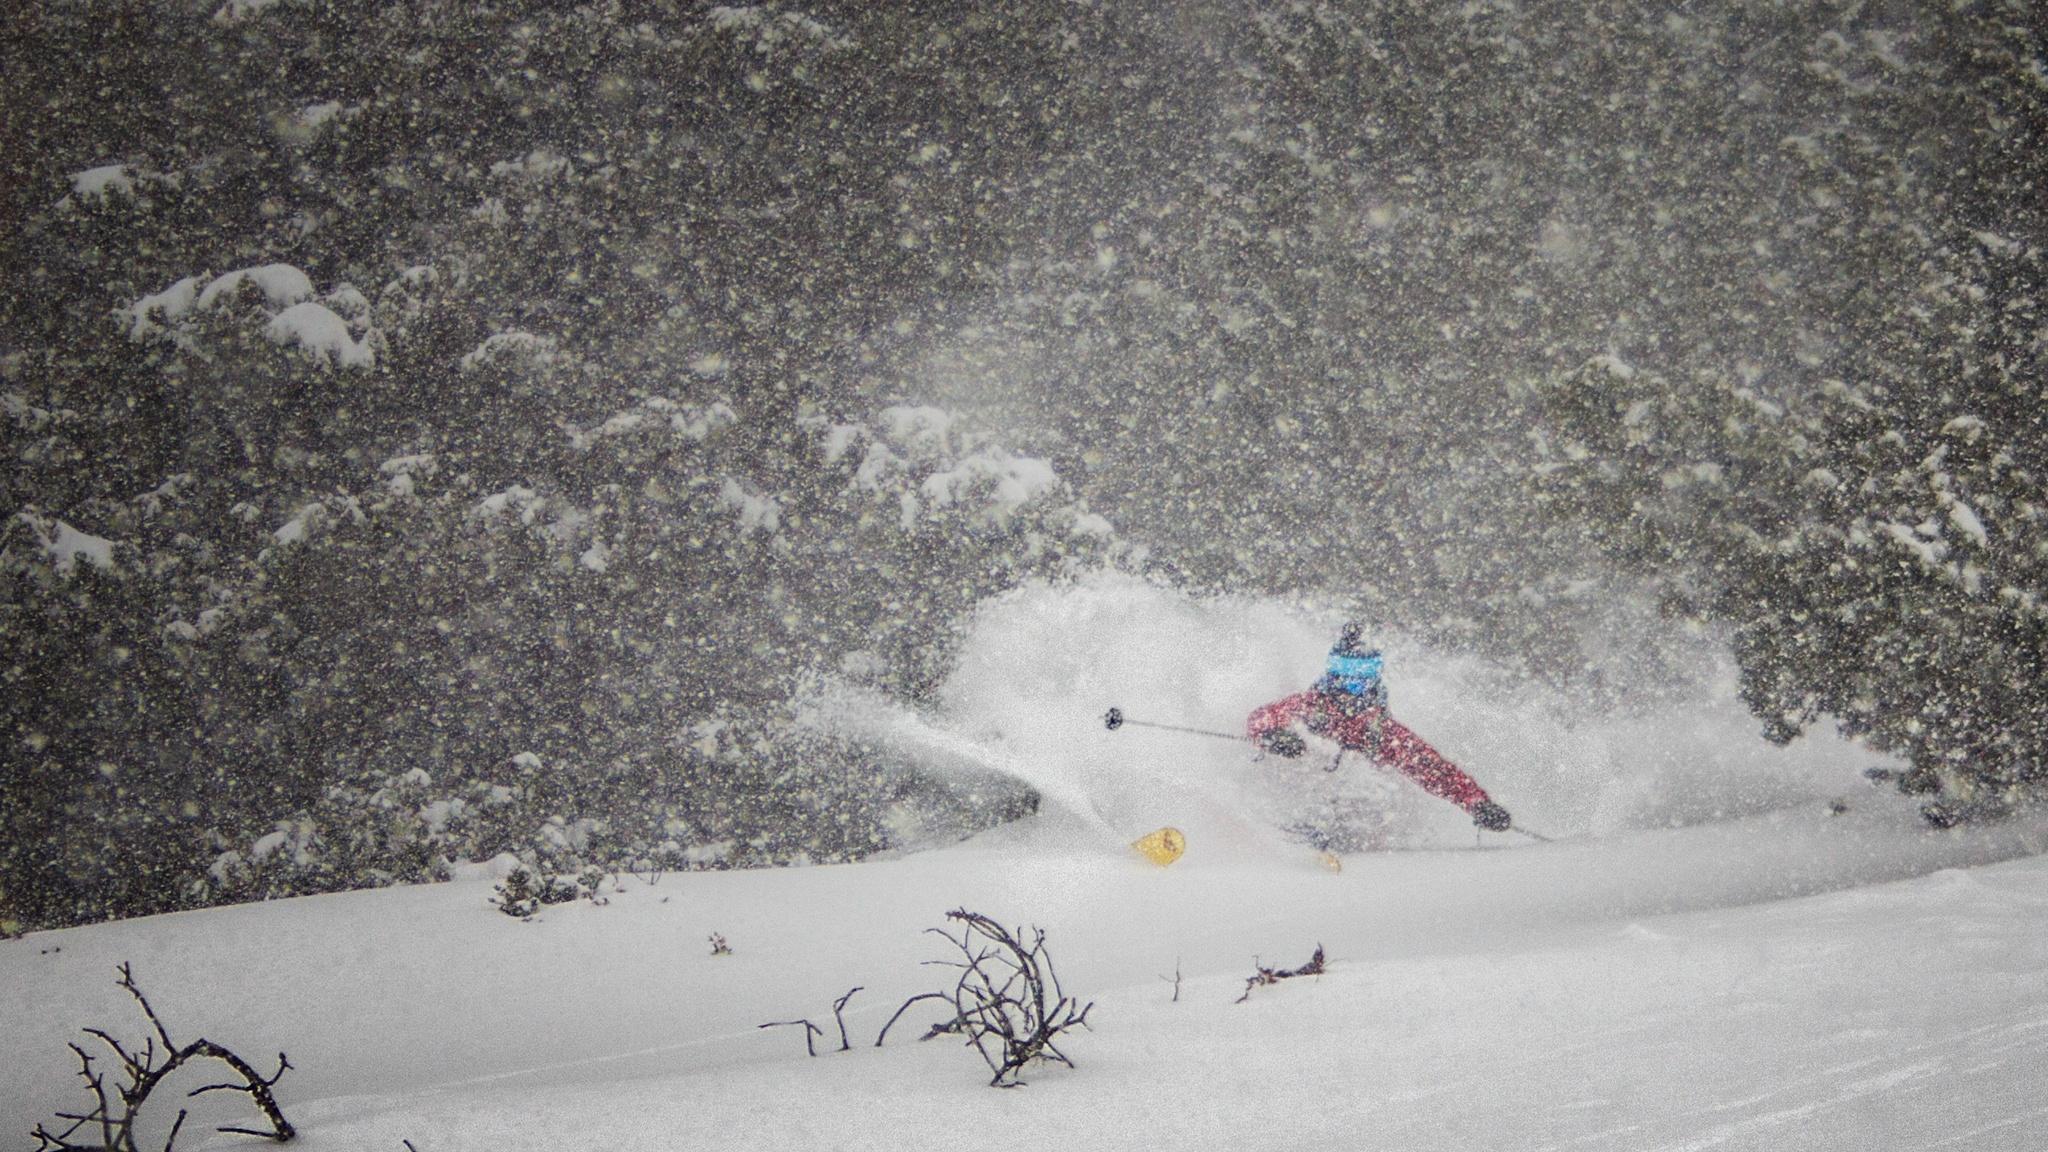 Candanchu, Javi Besga - Ski & Snowboard - Fotos del Valle del Aragón, Mikel Besga